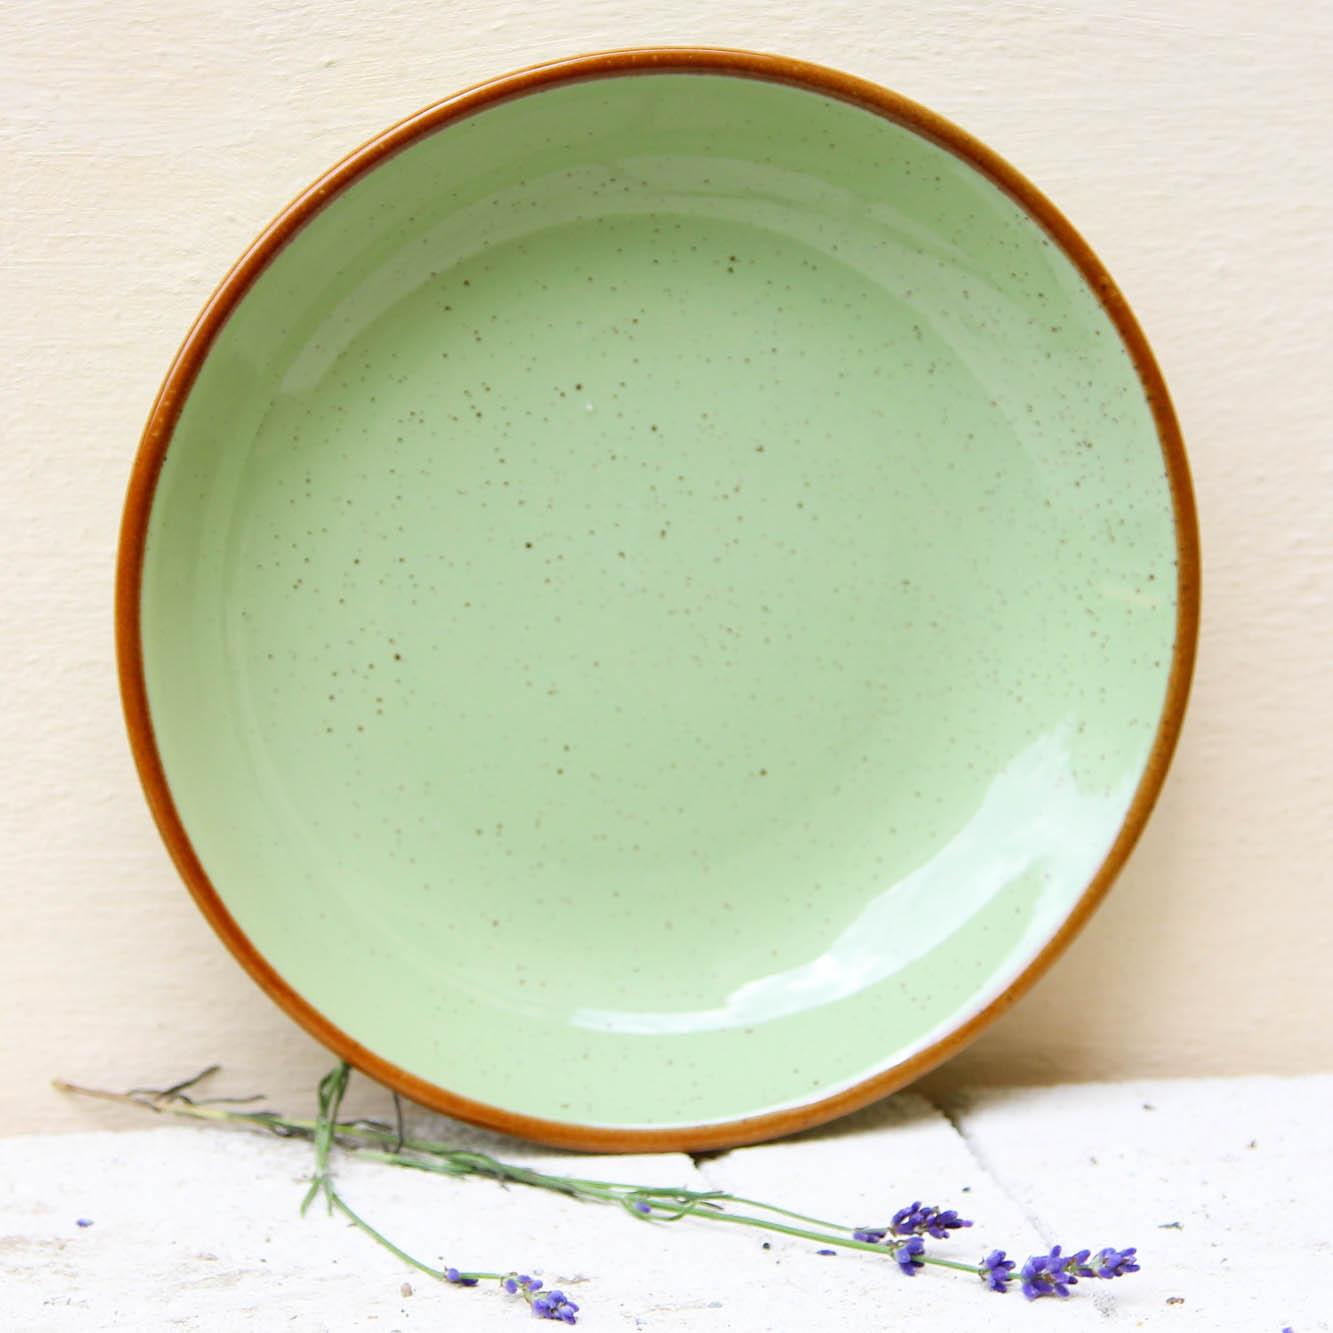 Farfurie adanca Gardena din ceramica verde 23 cm chicville 2021